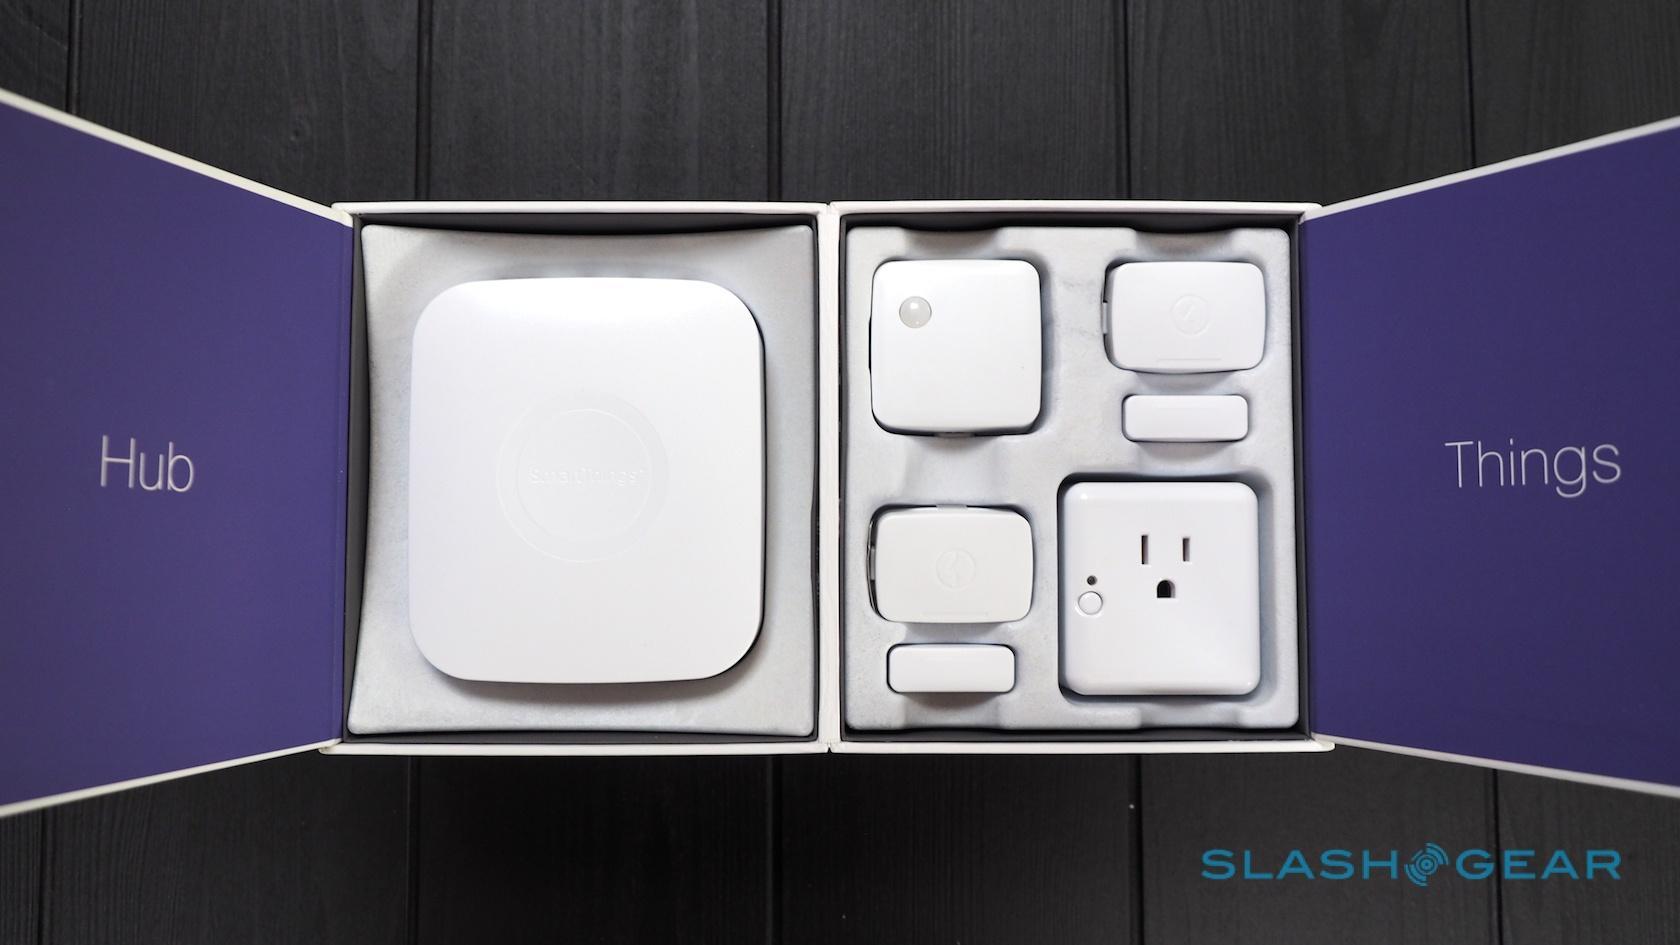 SmartThings outage takes down Samsung's home hub - SlashGear